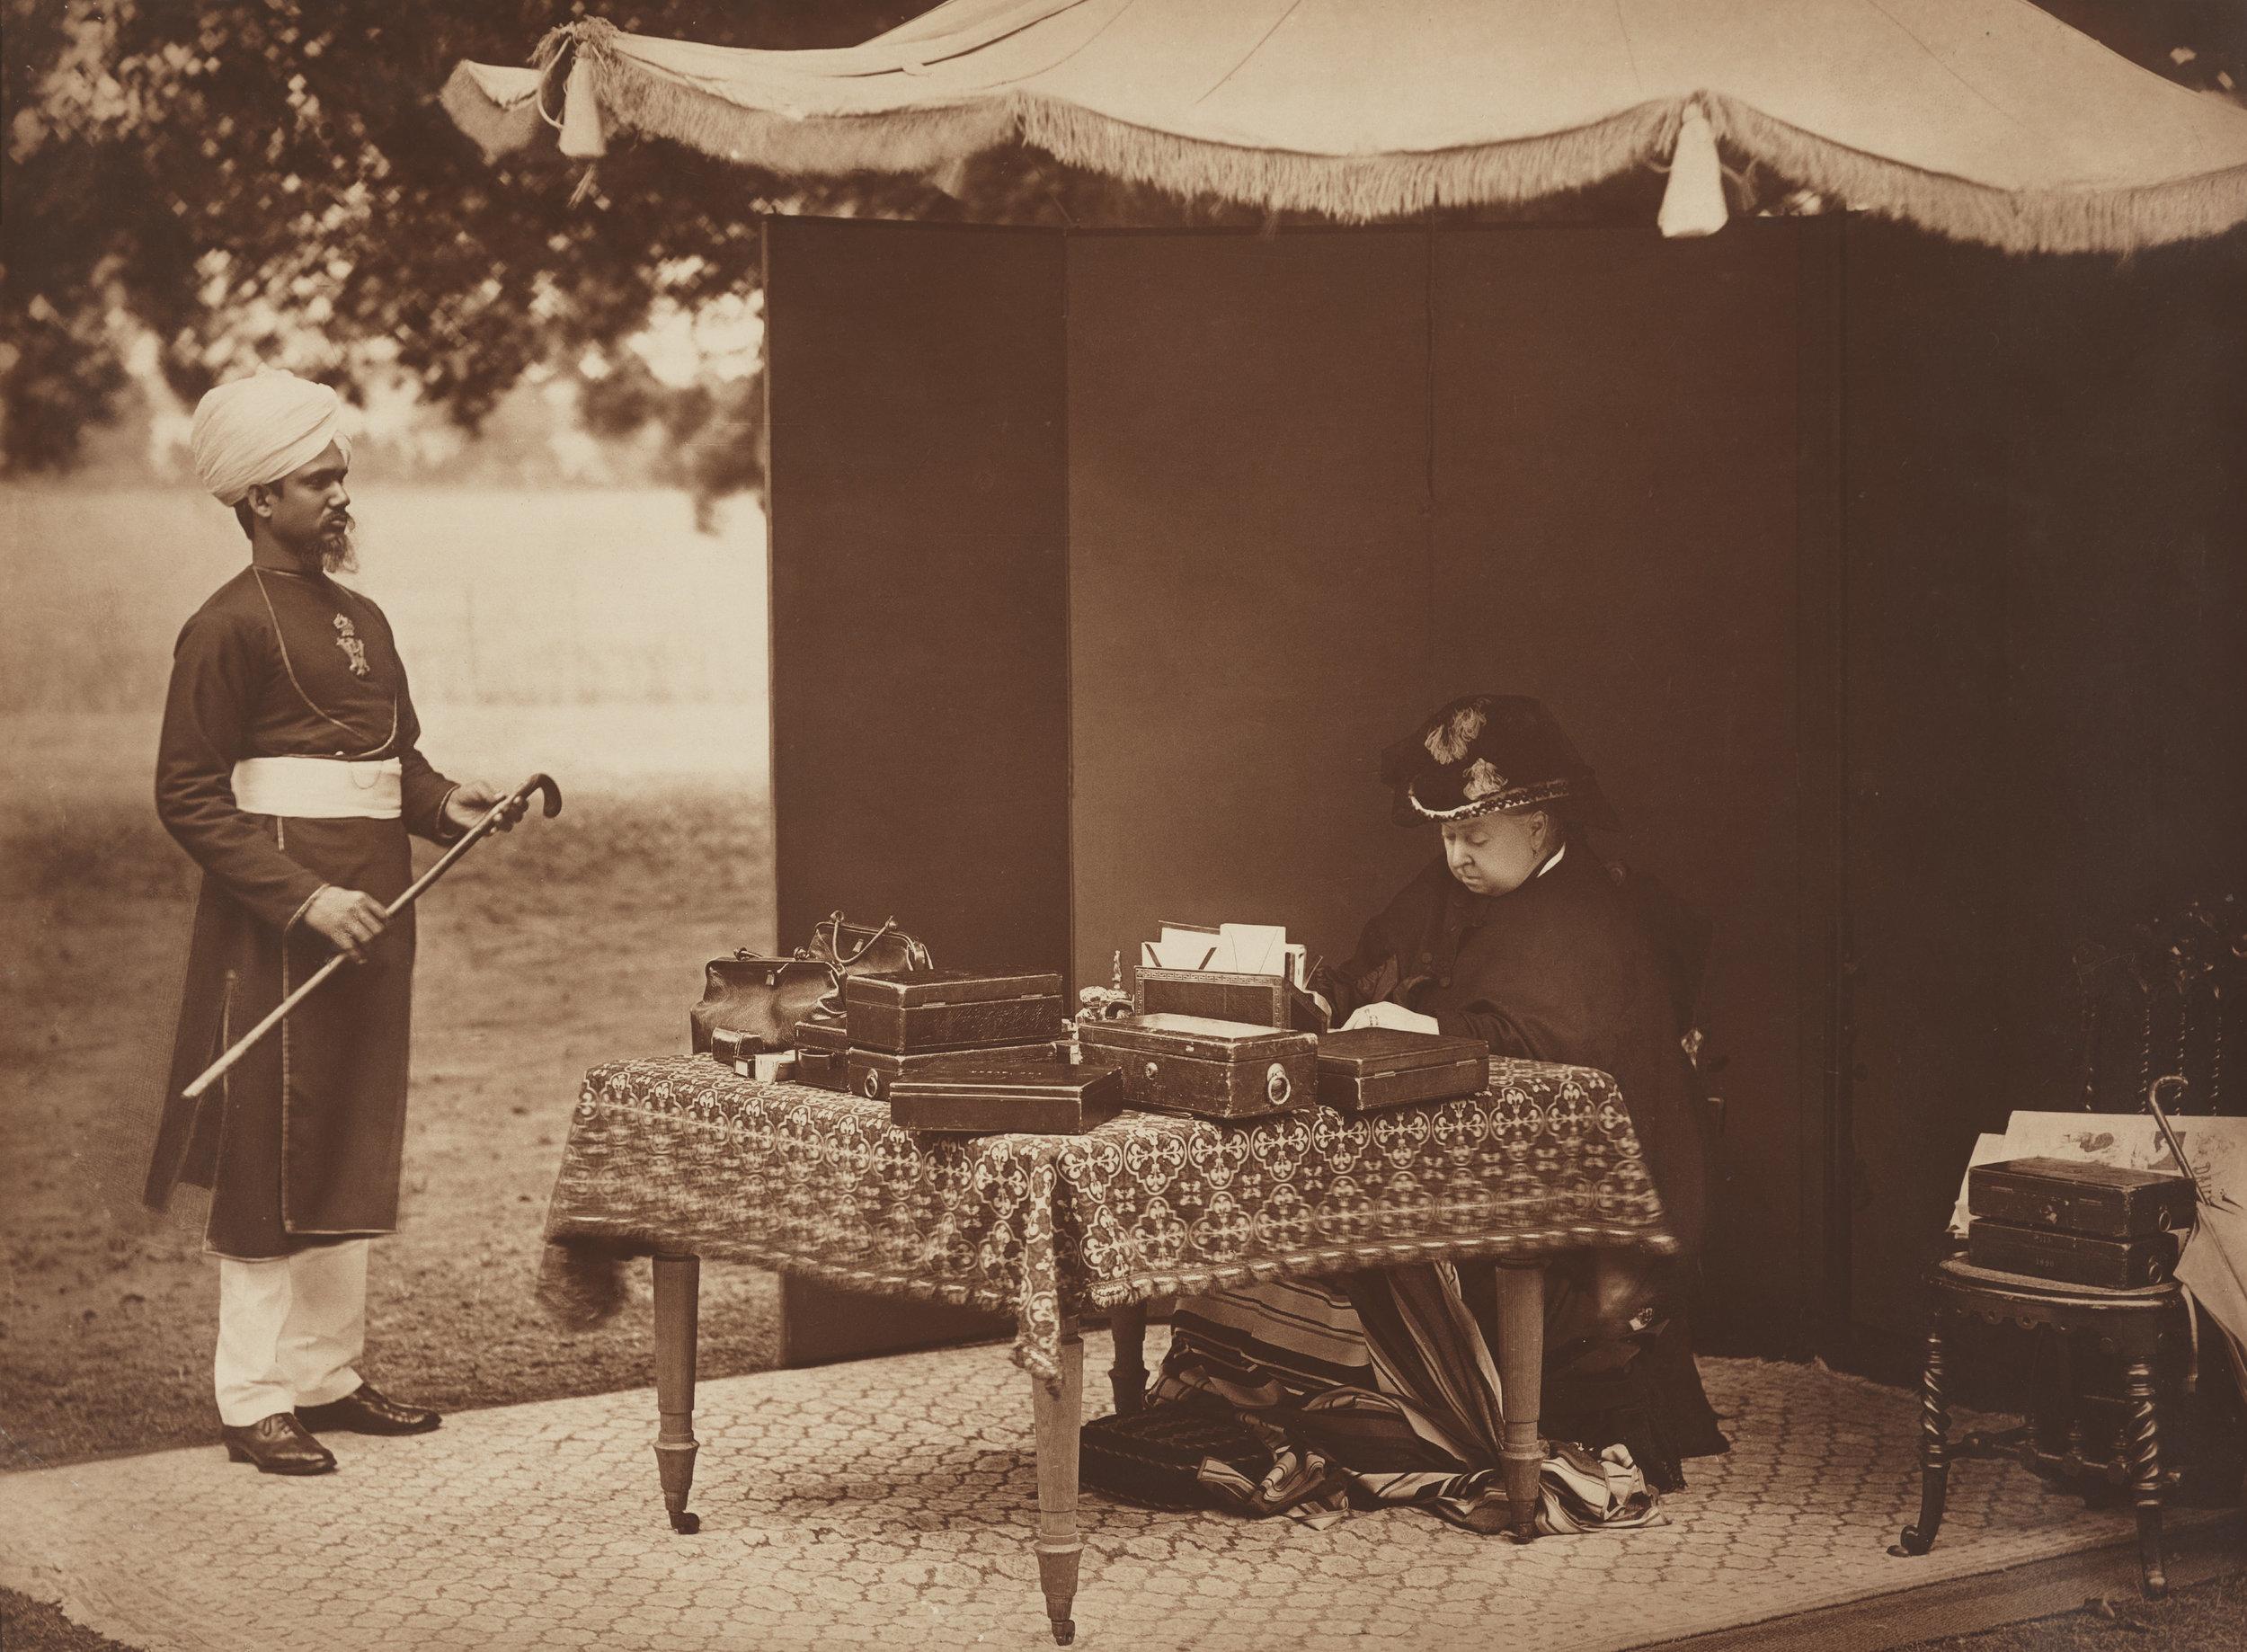 Sheikh Chidda, Abdule Karim and Queen Victoria, 1893 © National Portrait Gallery, London